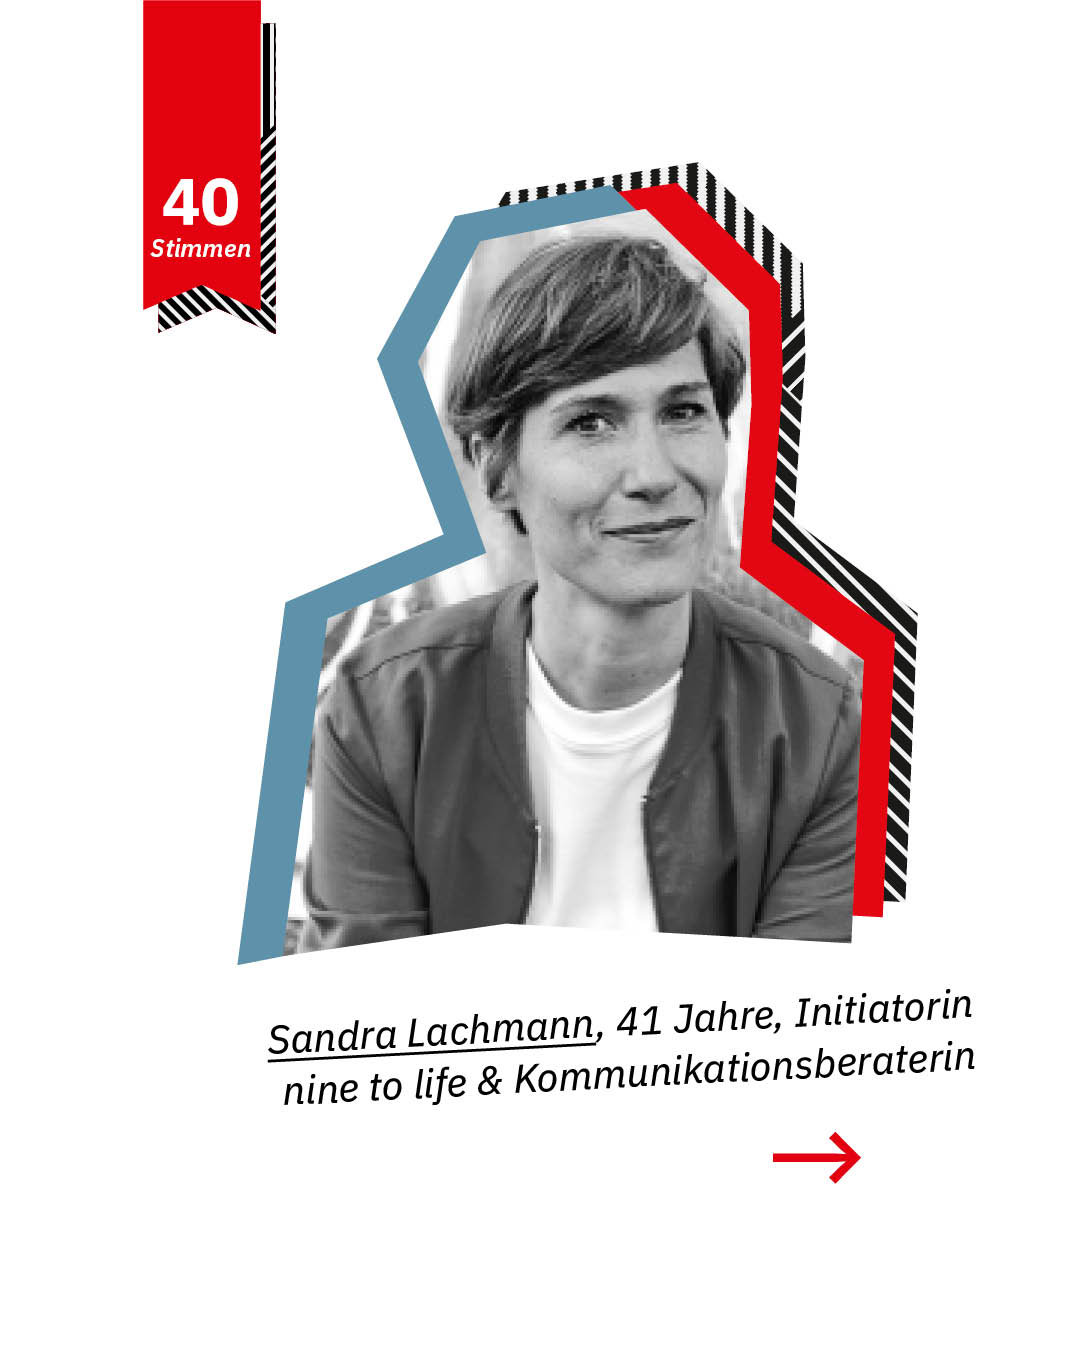 Sandra Lachmann, Initiatorin nine to life, Kommunikationsberaterin